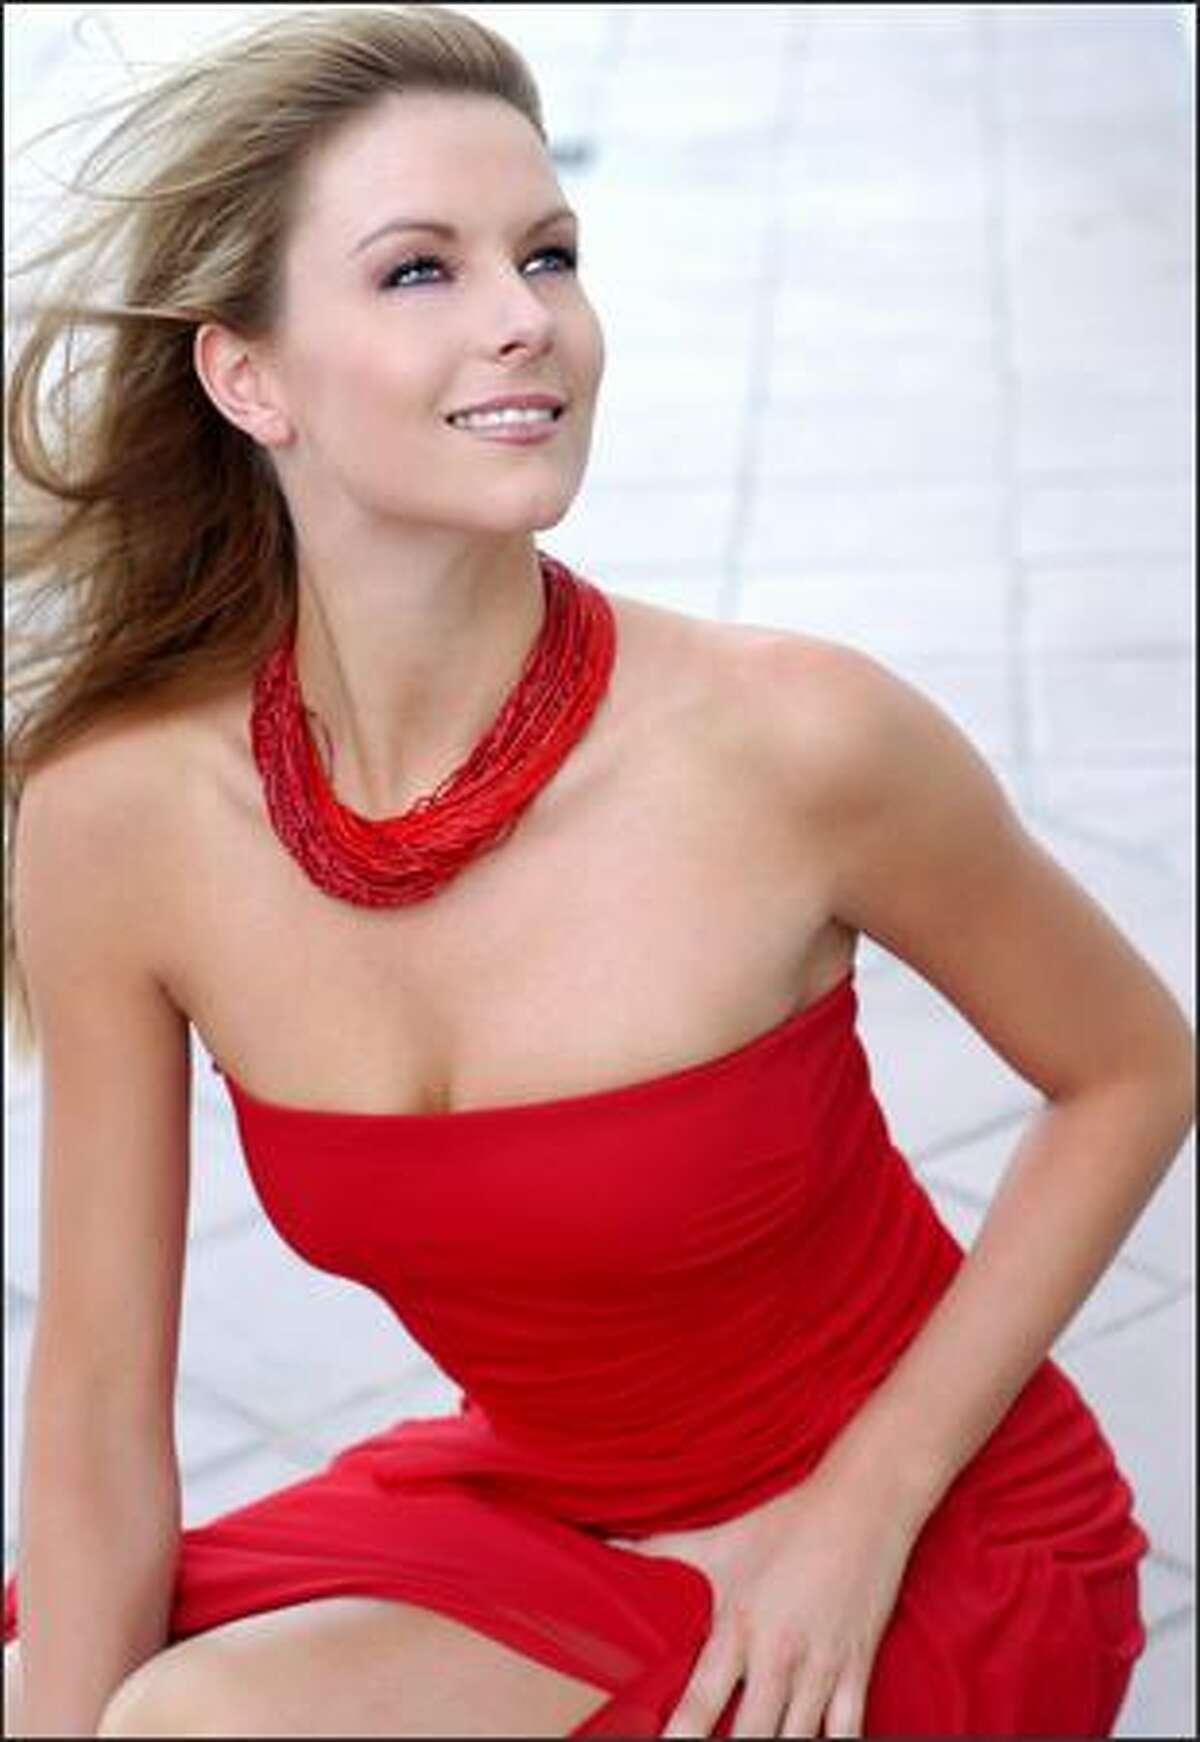 Jennifer Hawkins poses for New York fashion photographer Fadil Berisha on May 14.